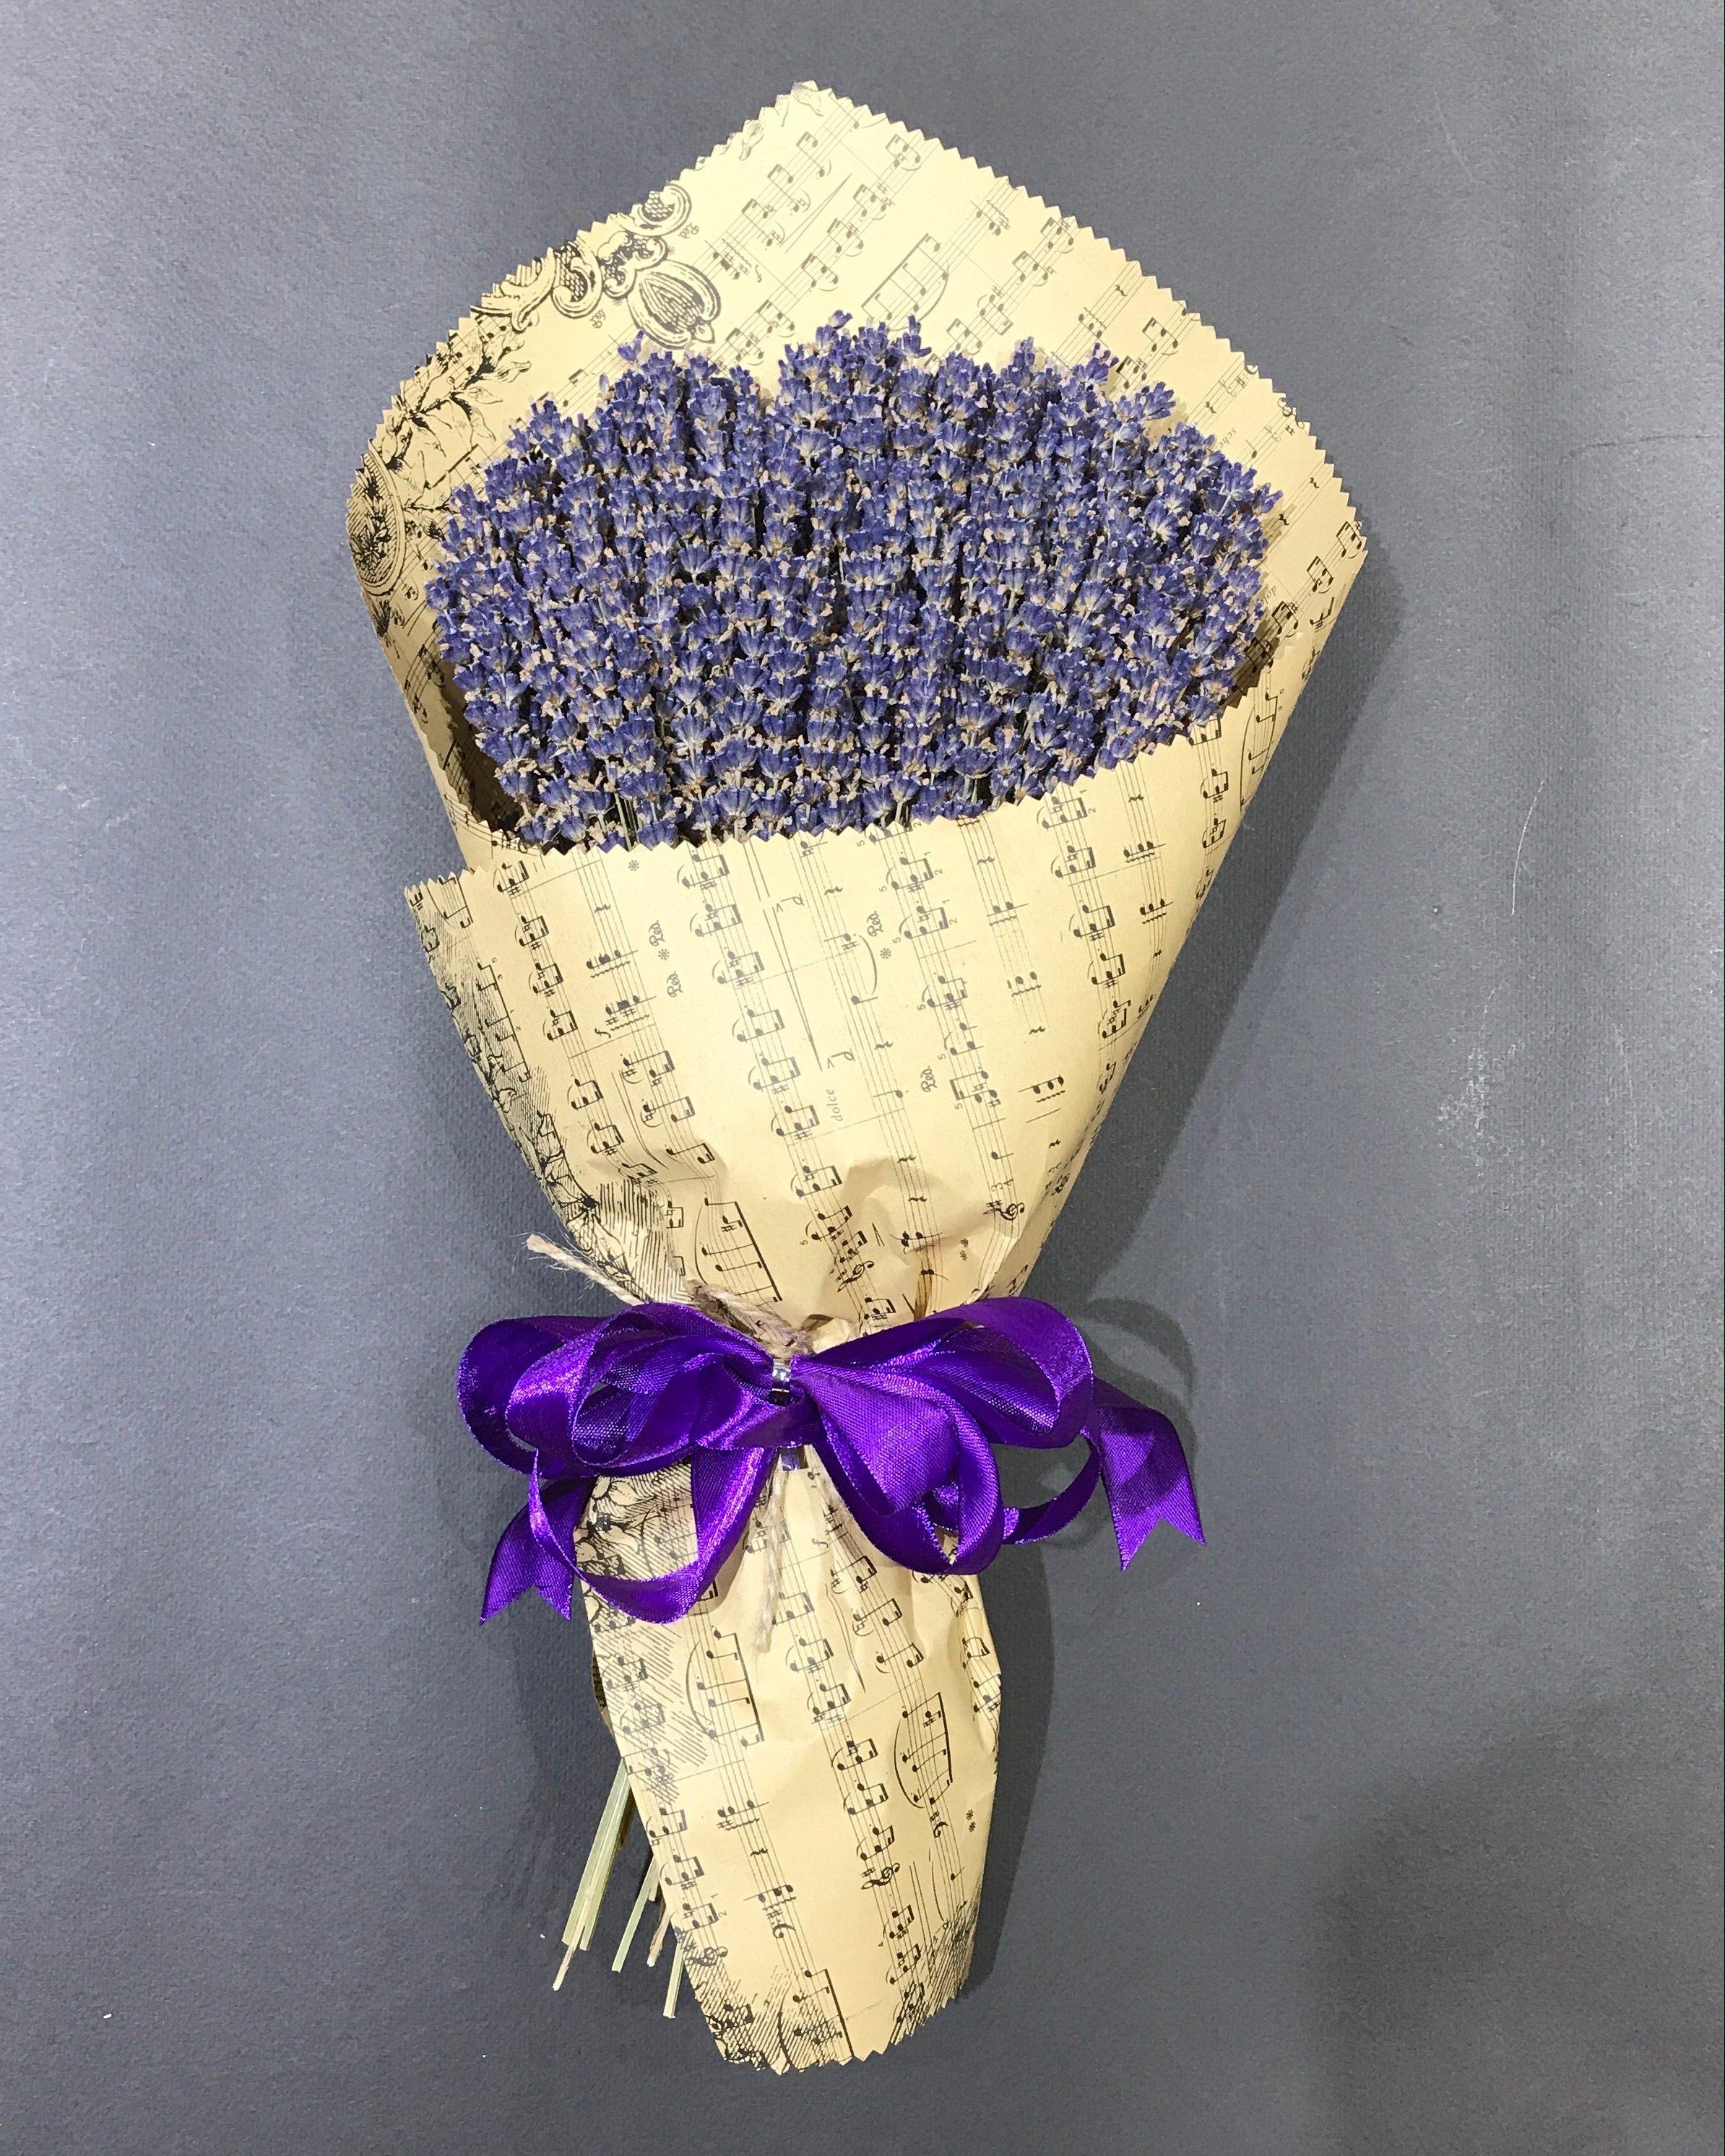 Bó hoa lavender khô Pháp